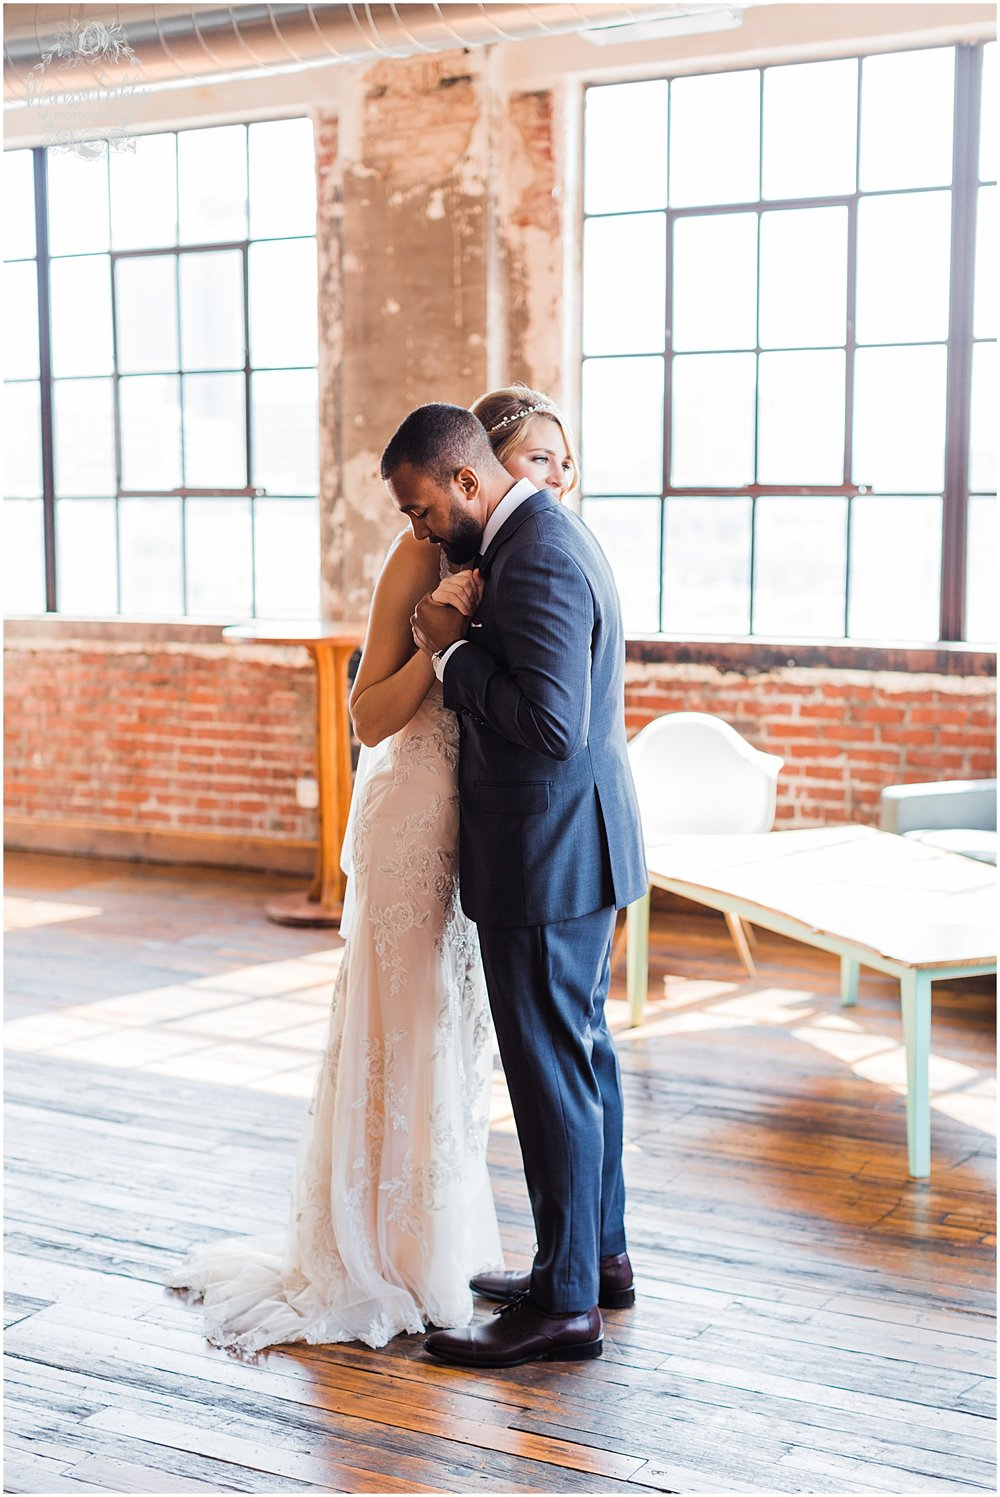 BAUER WEDDING   KELSEA & JUSTIN   MARISSA CRIBBS PHOTOGRAPHY_6508.jpg